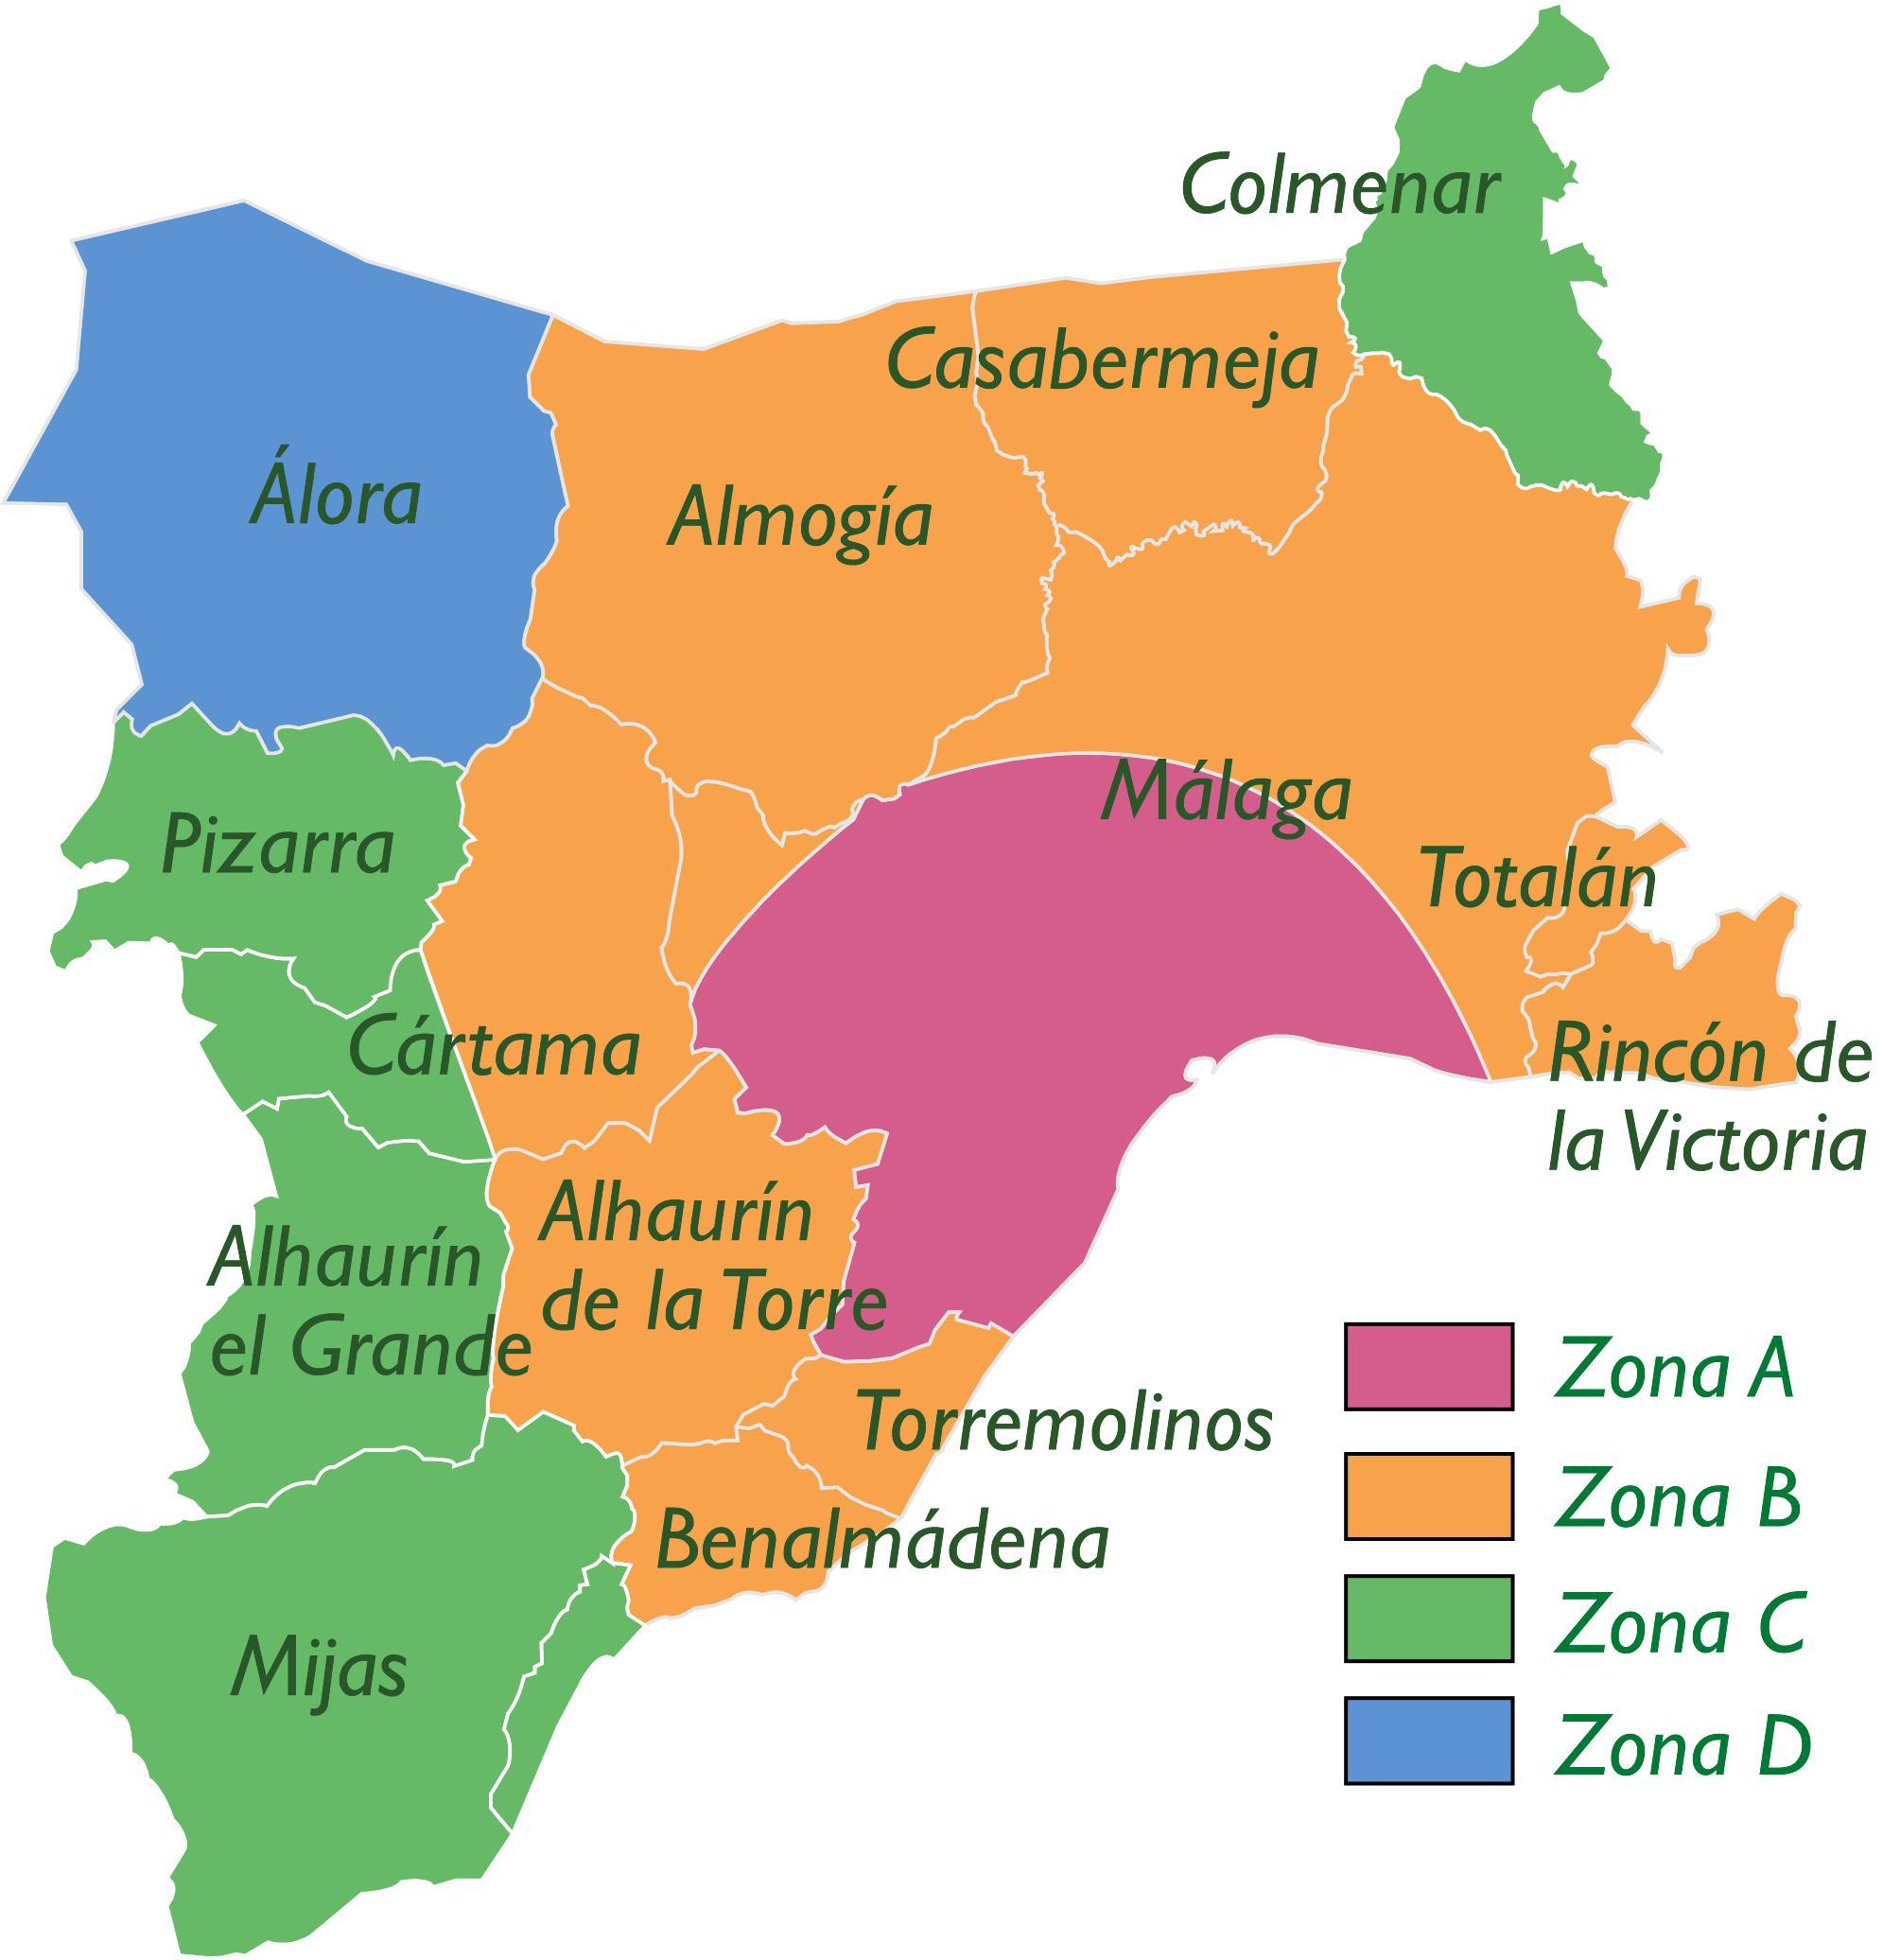 Mapa de zonificación